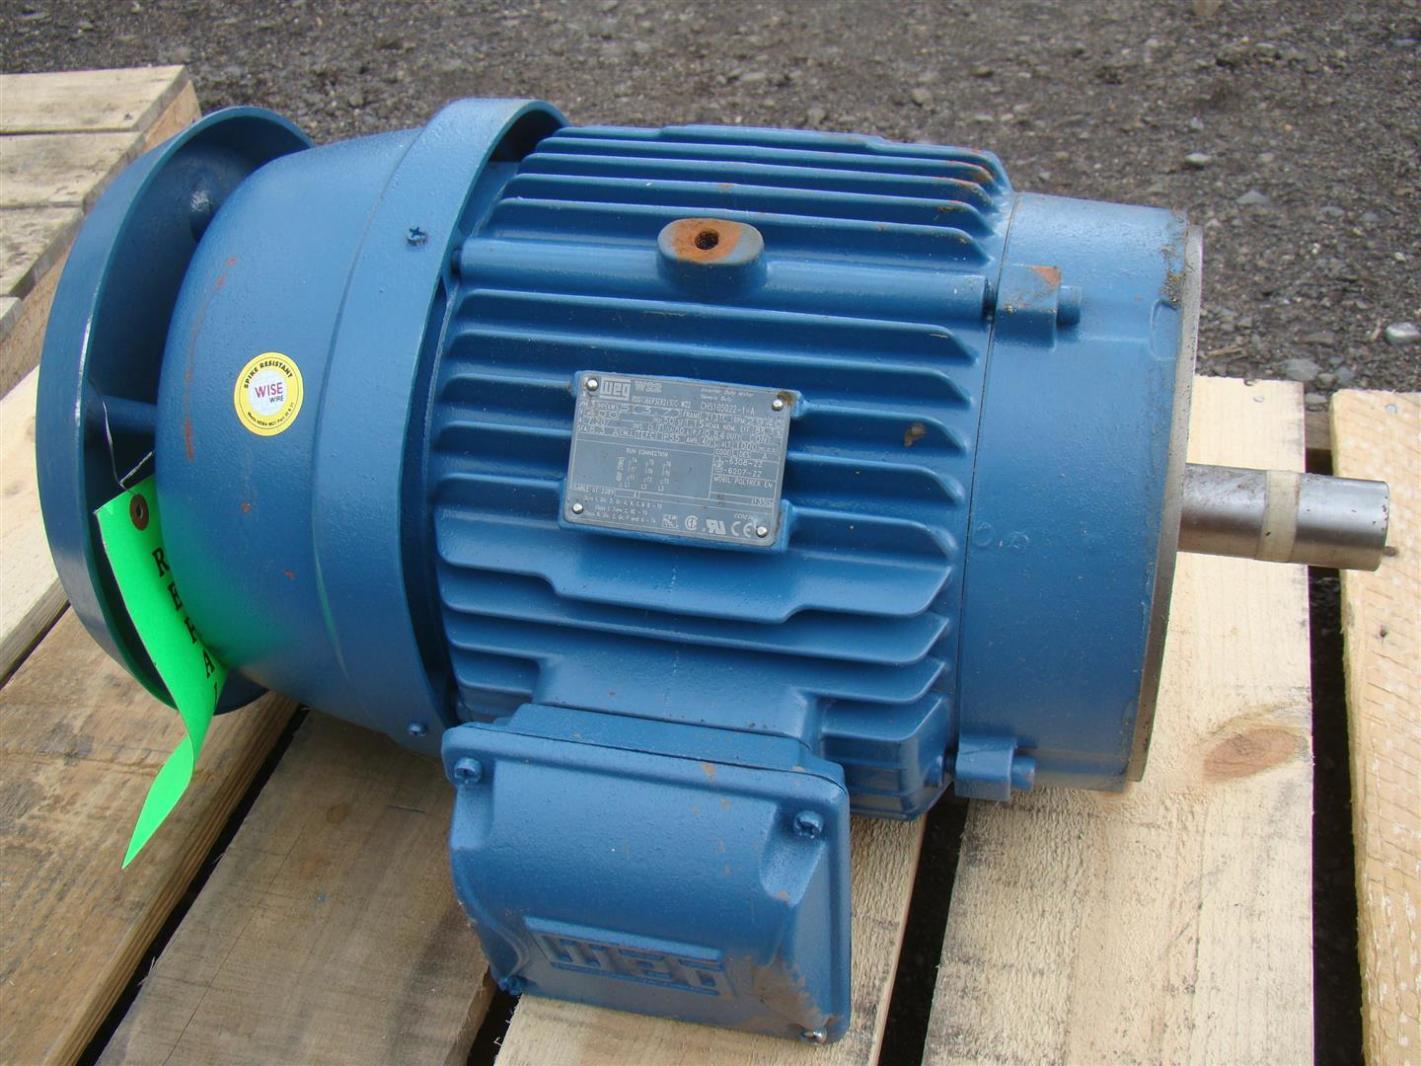 Weg 3 Phase Electric Motor Inverter Duty 5 Hp 2940 Rpm